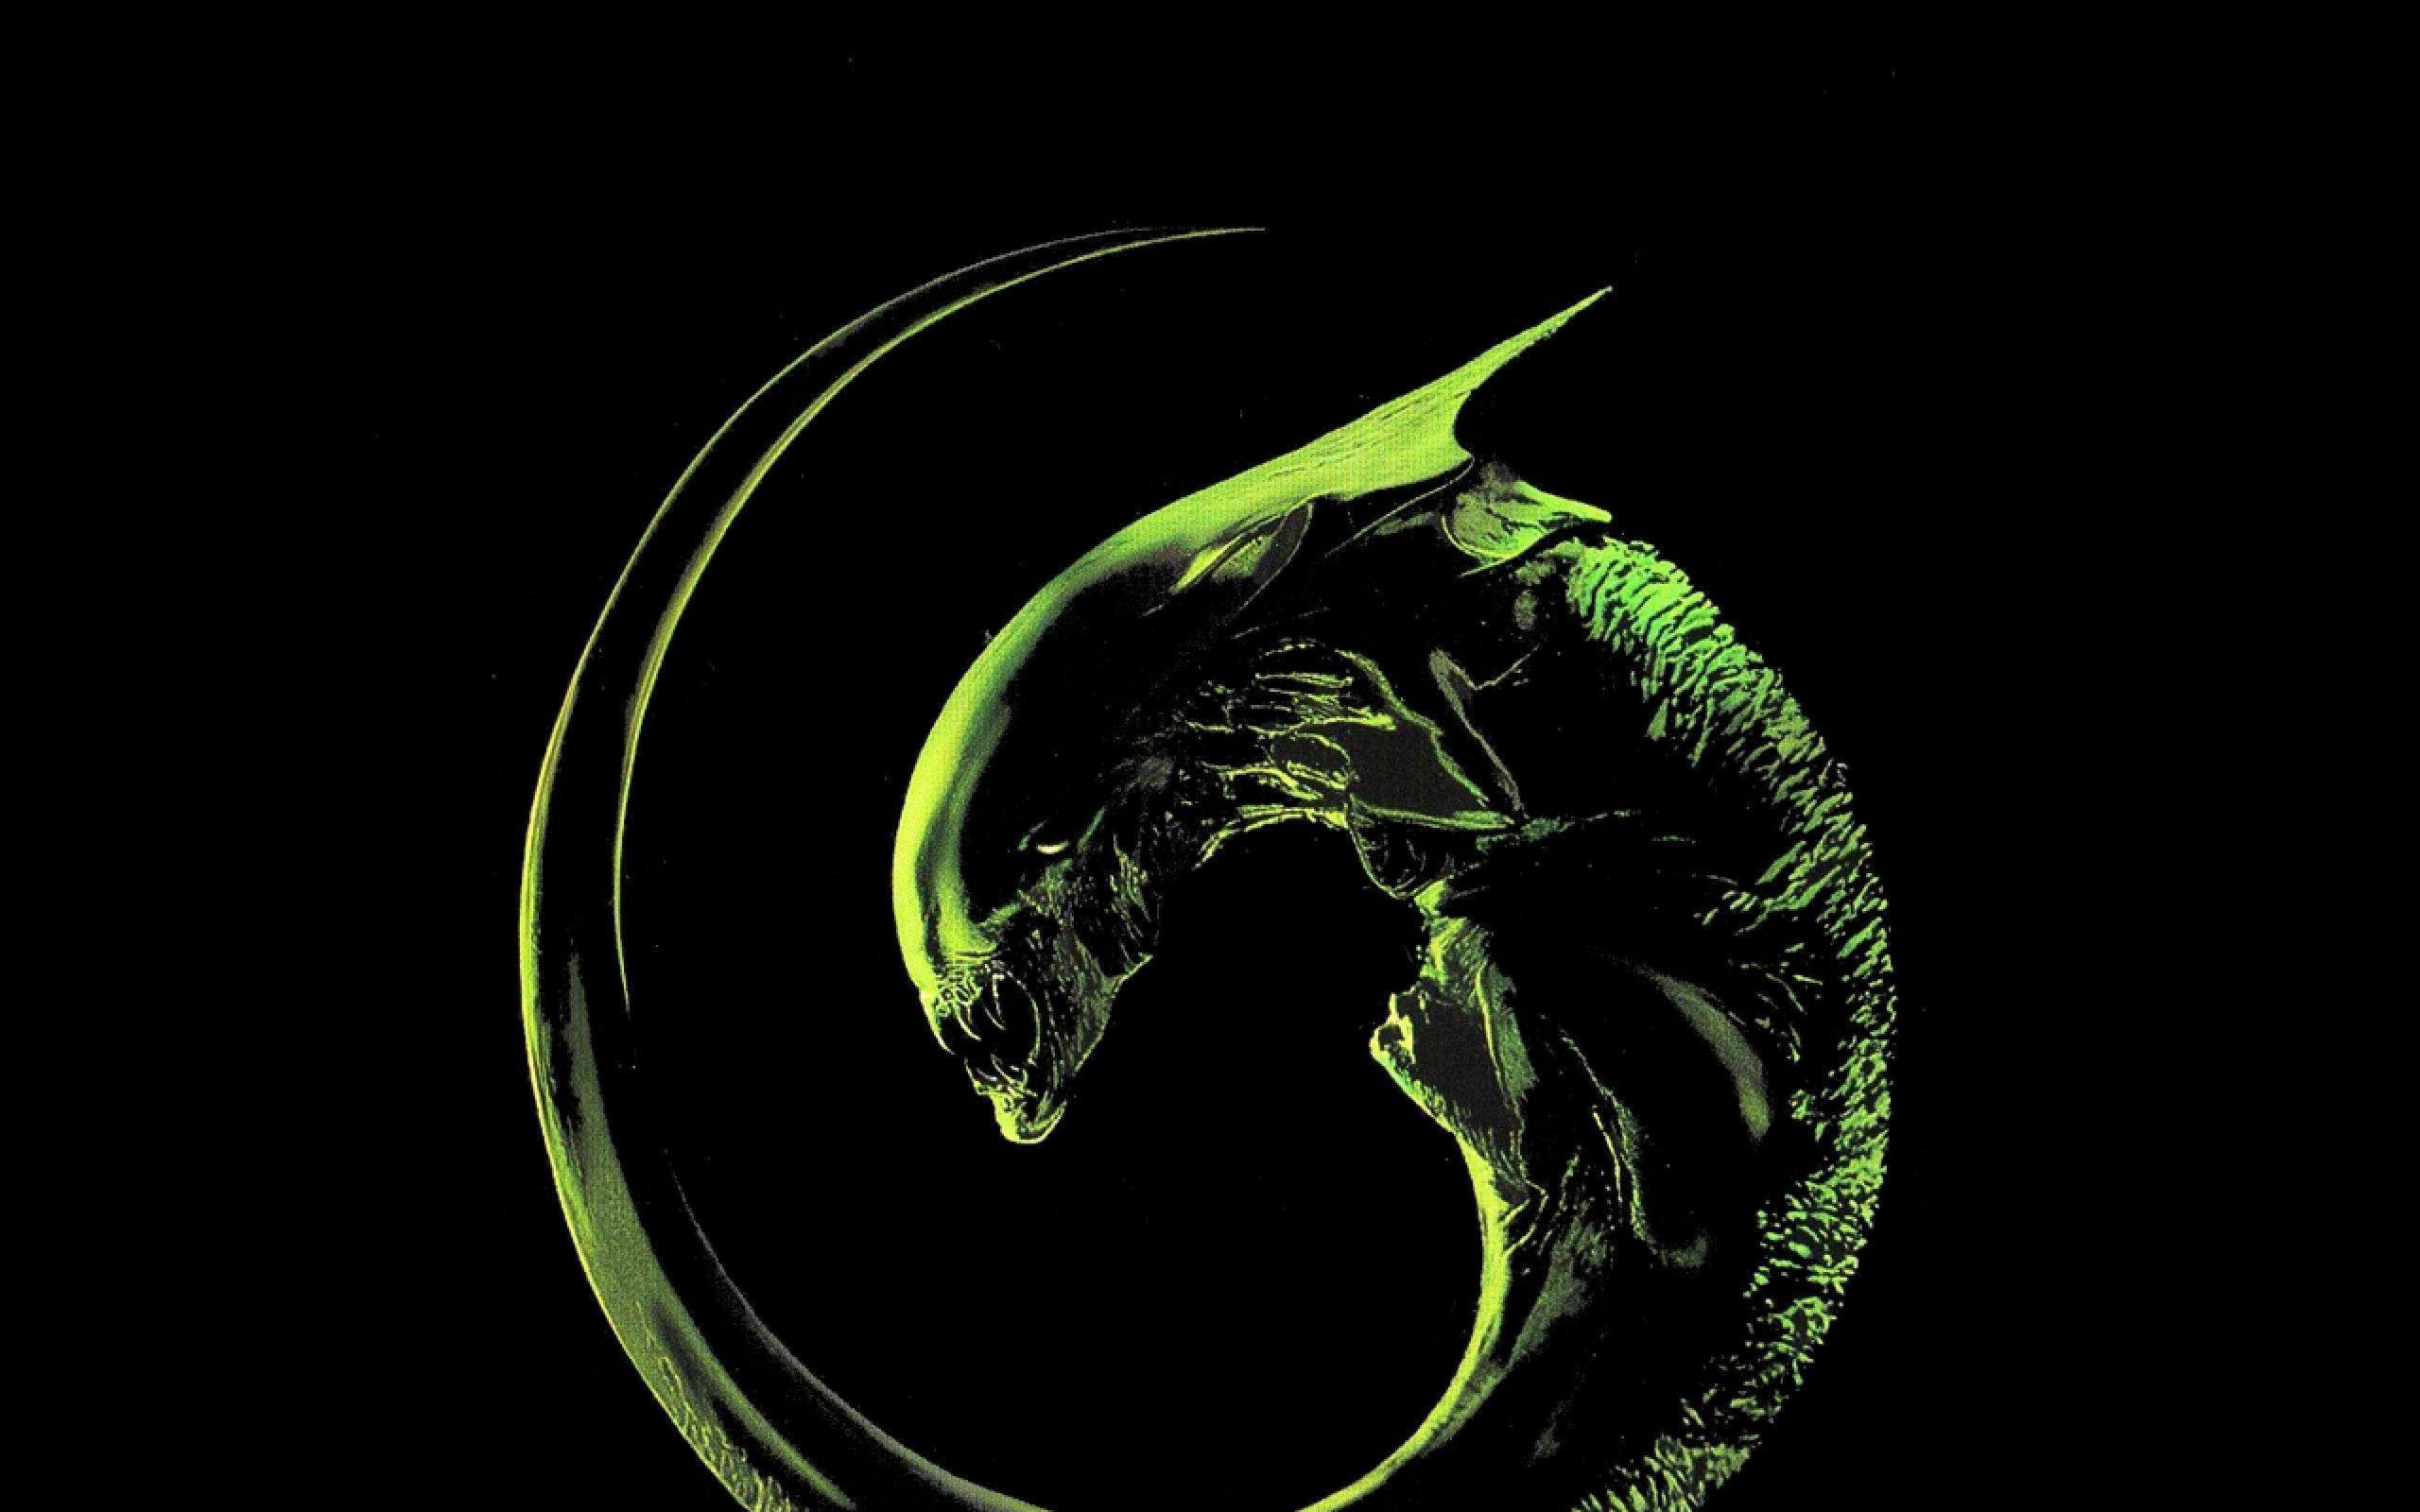 Alien Movie Wallpapers - Wallpaper Cave